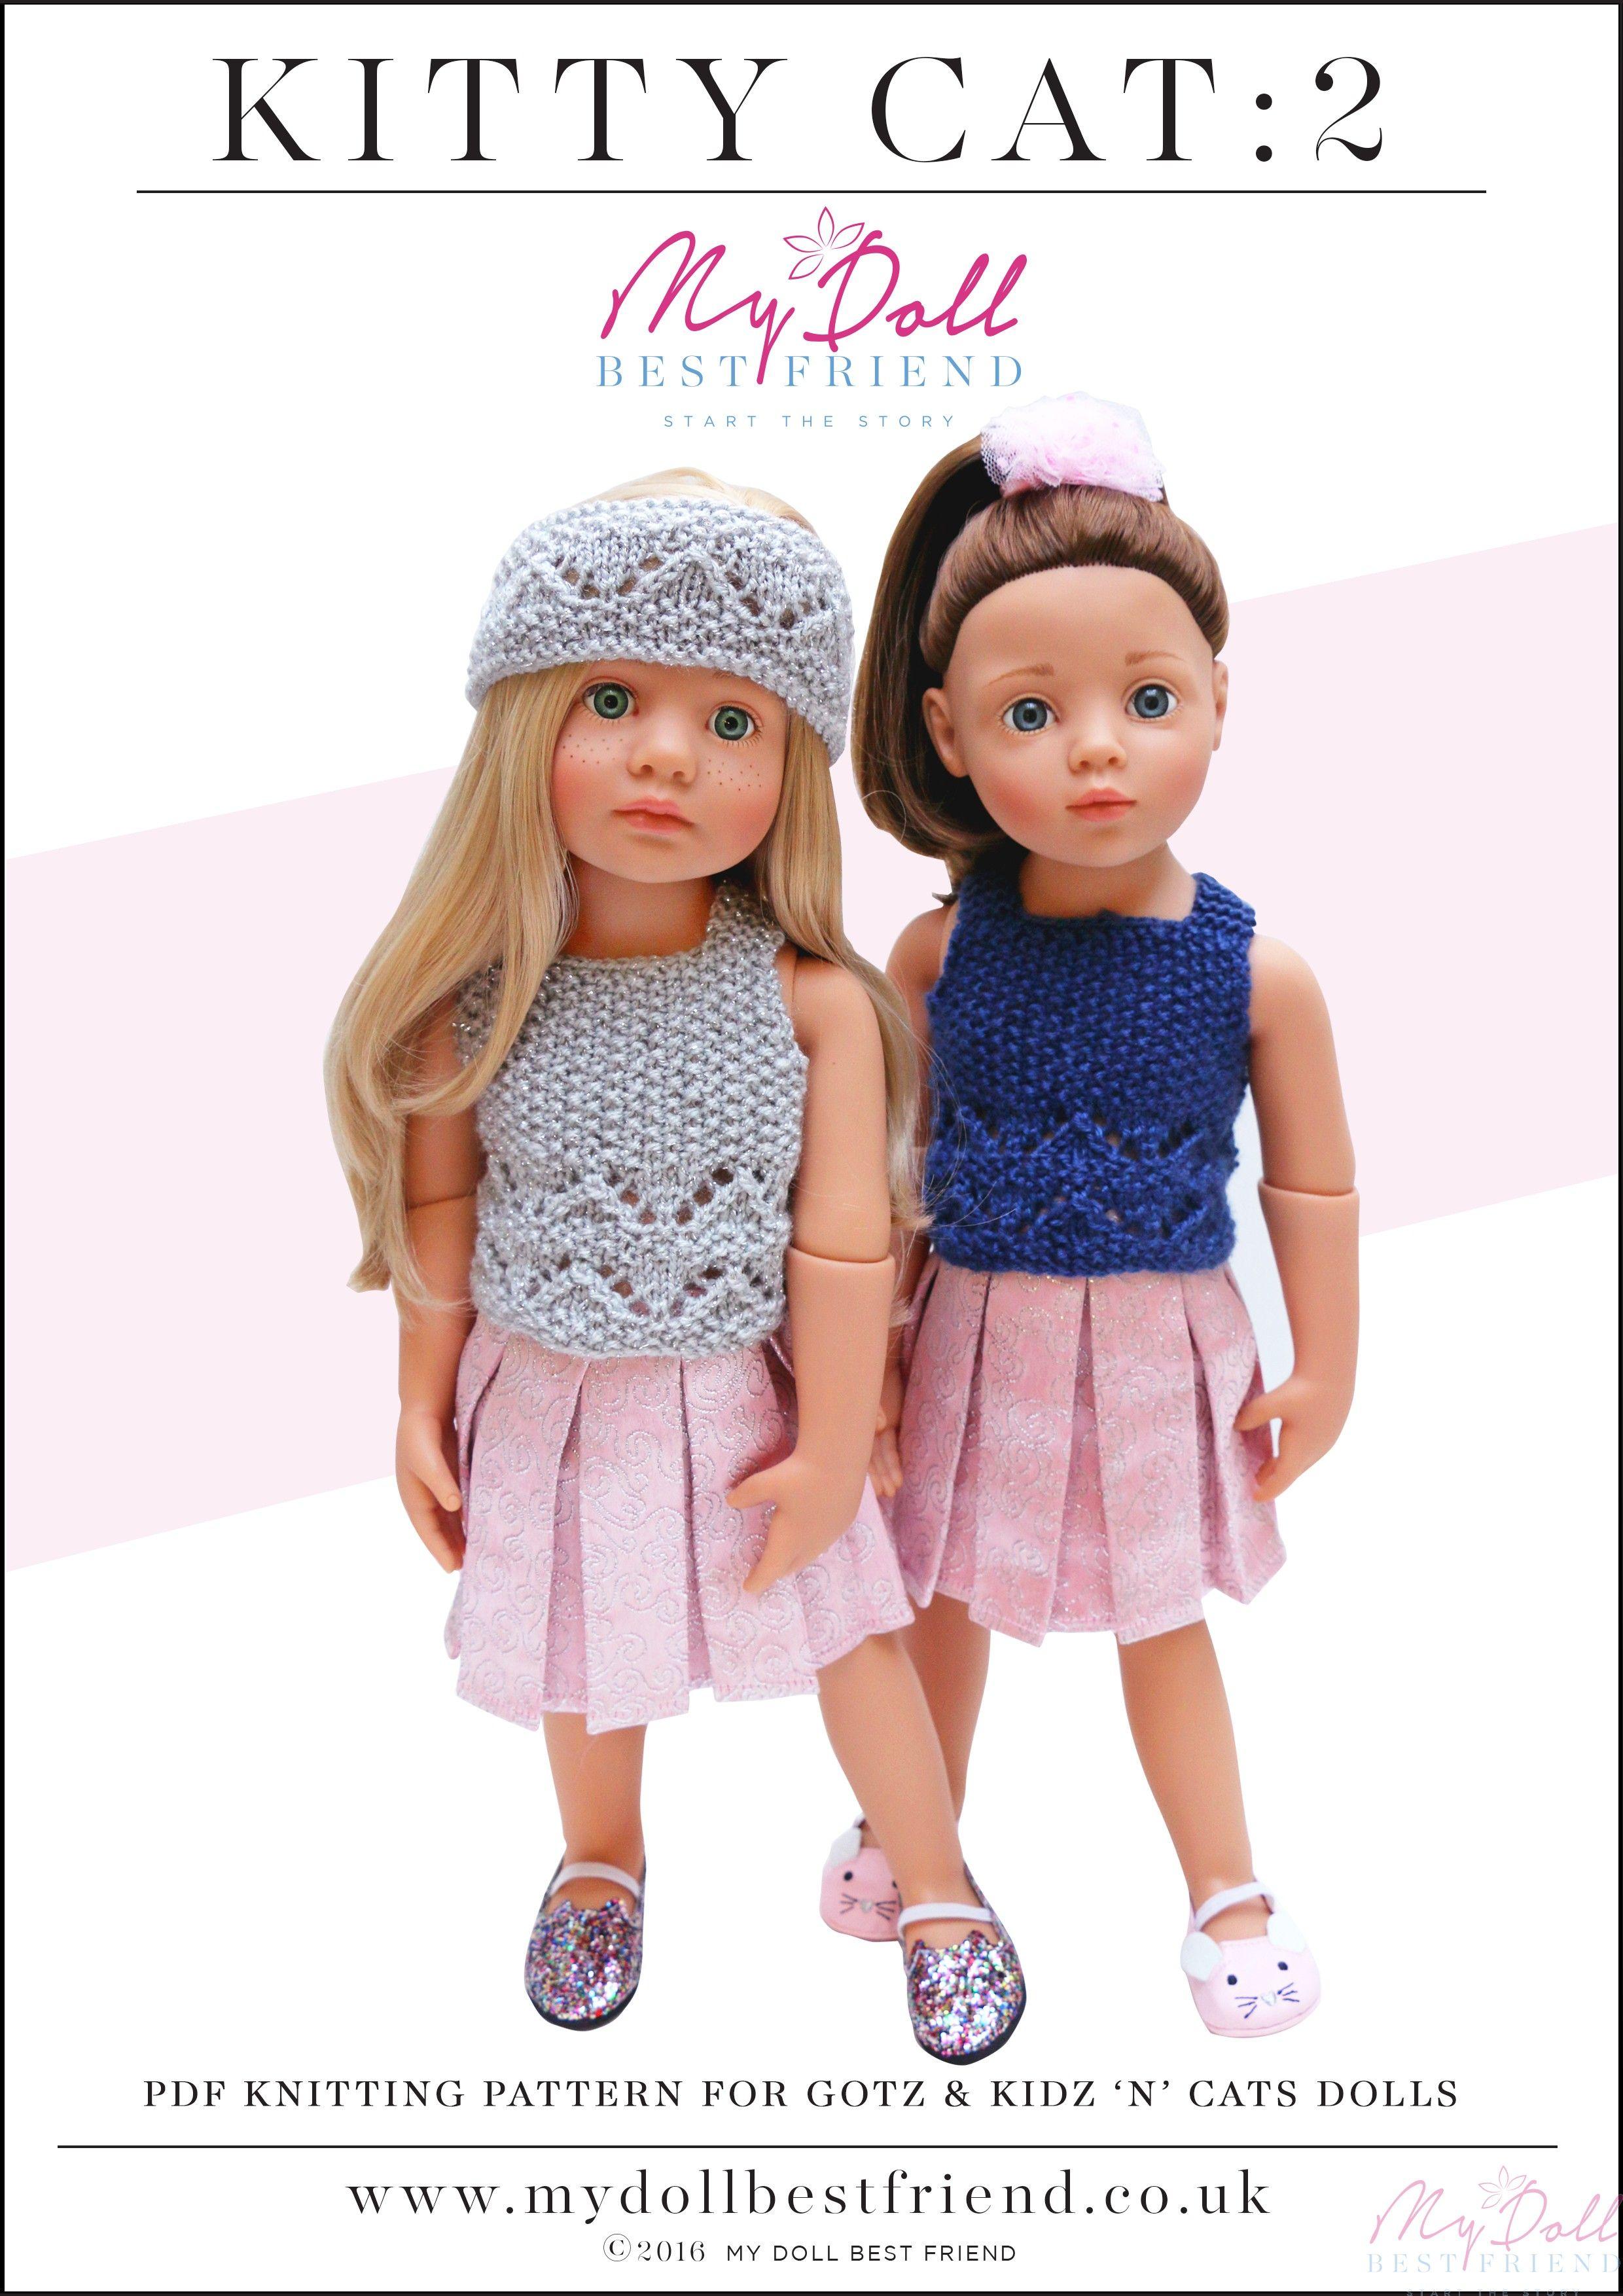 Doll Knitting Pattern 45-50cm: Kitty Cat 2   Kidz n Cats   Pinterest ...